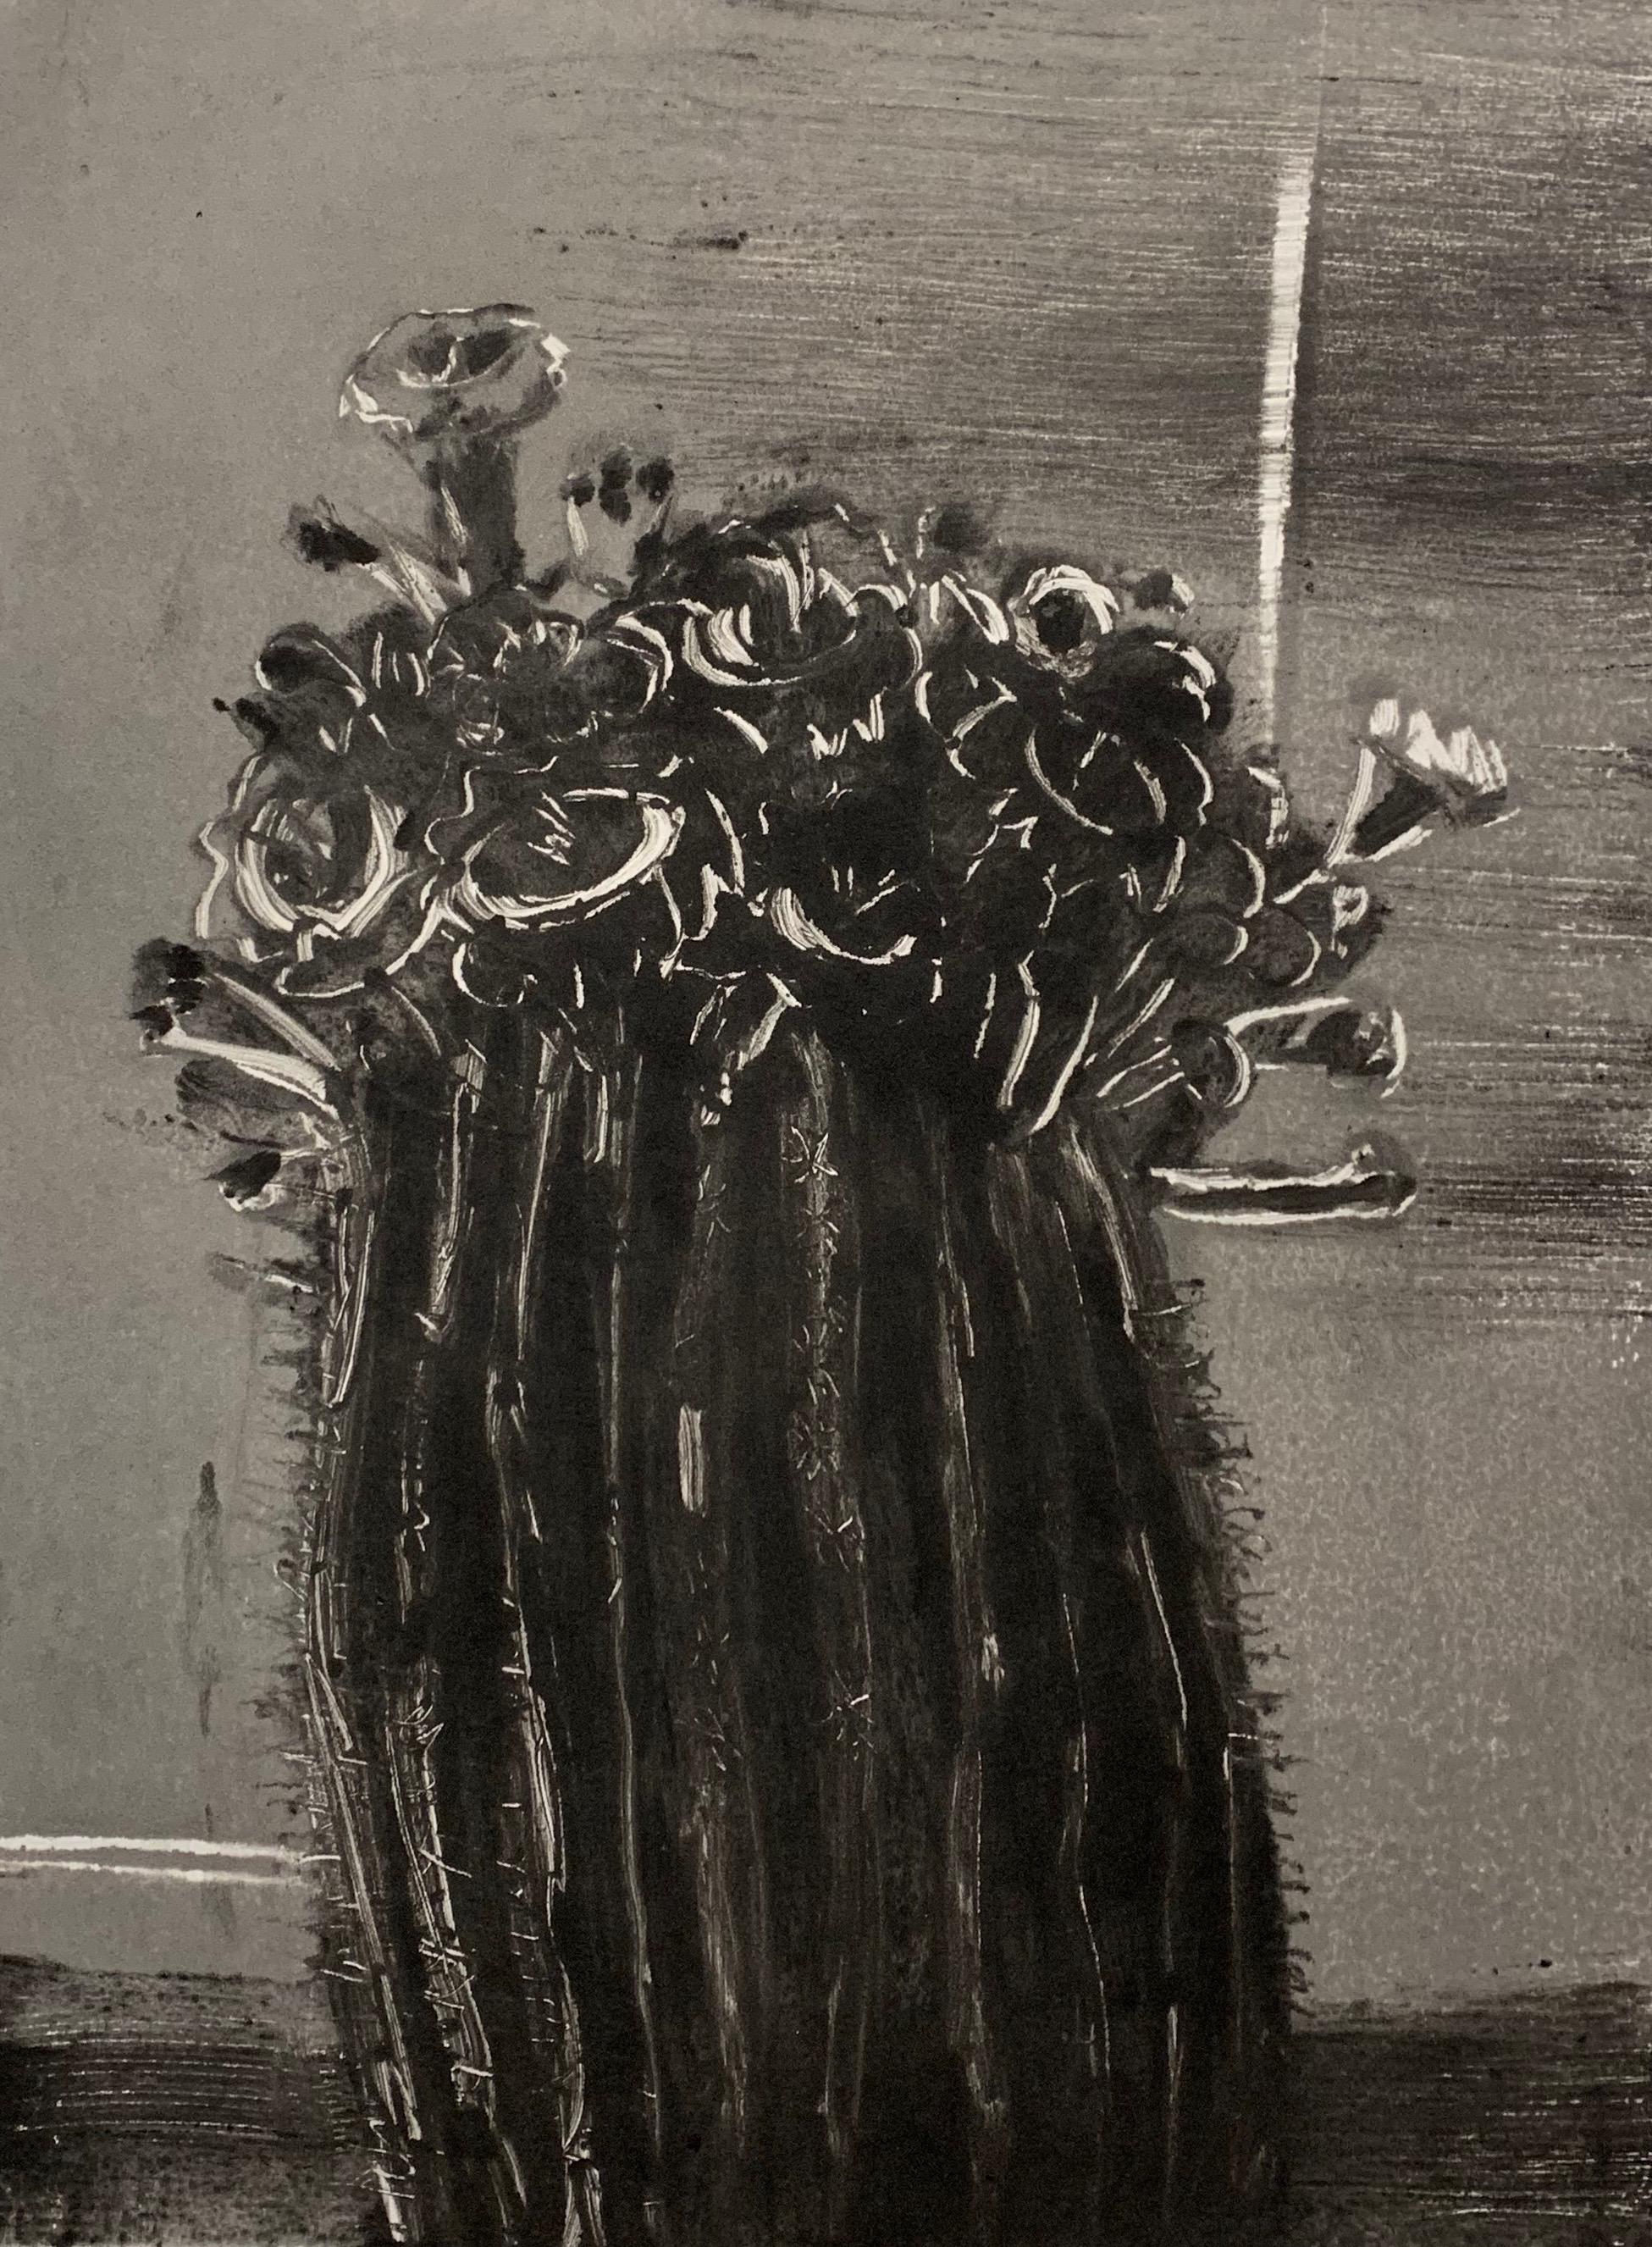 """Saguaro Cactus"", Monoprint, 10"" x 14"", 2019."